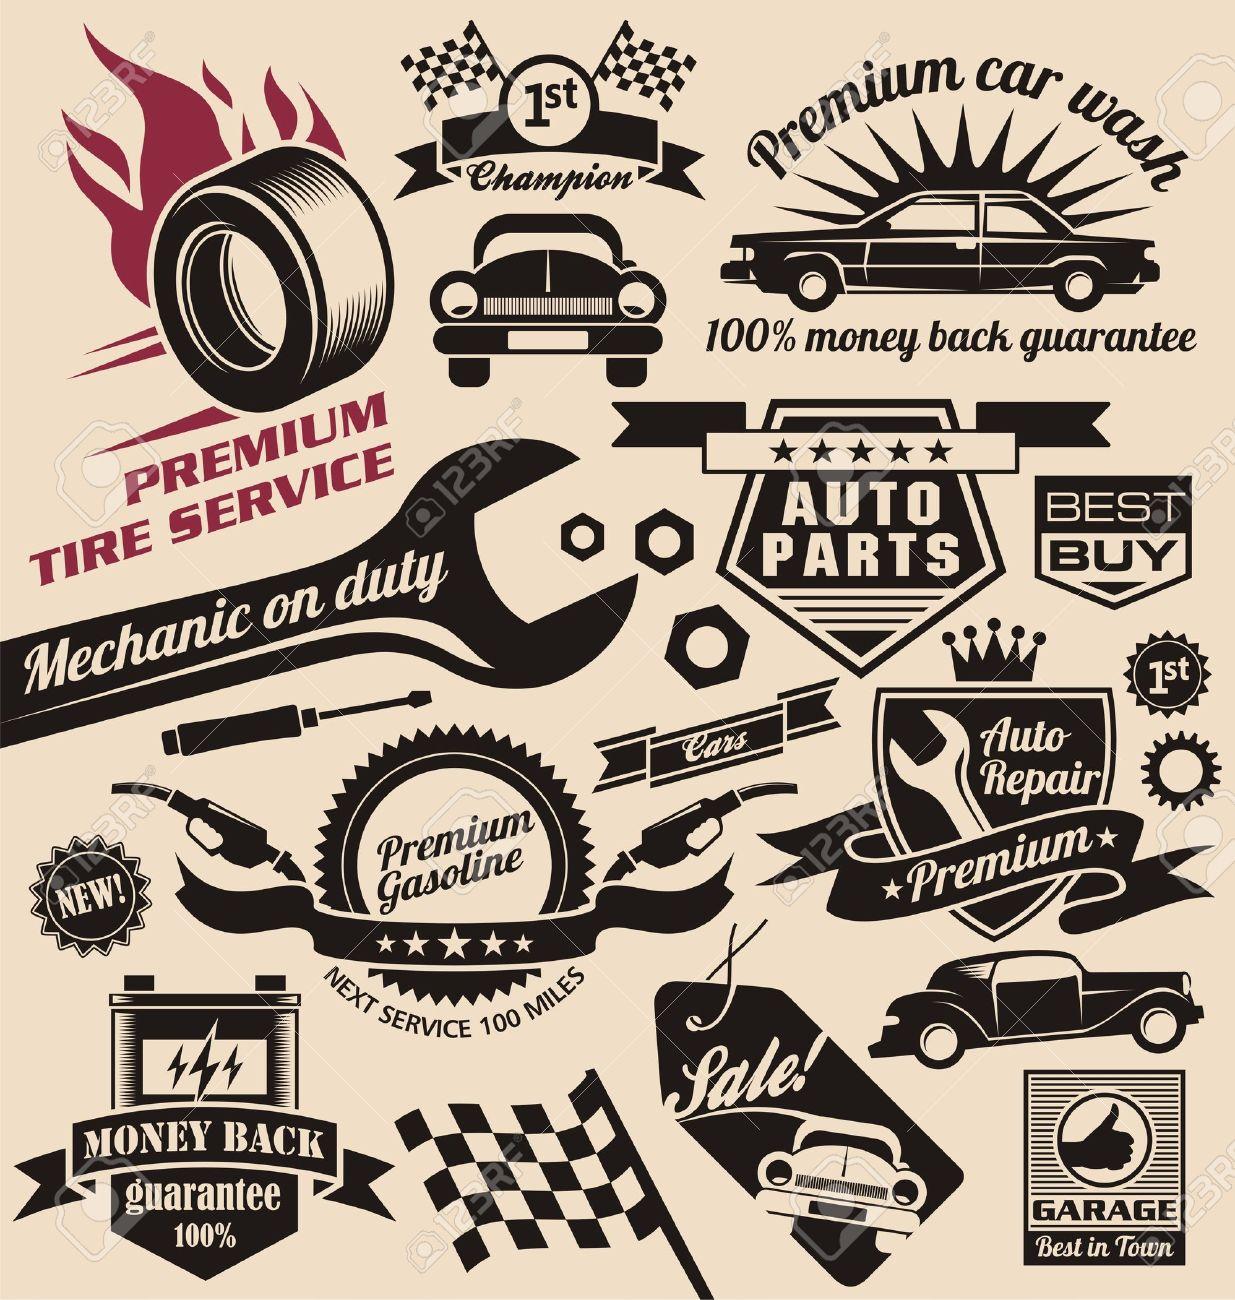 Set Of Vintage Car Symbols And Logos Royalty Free Cliparts ...